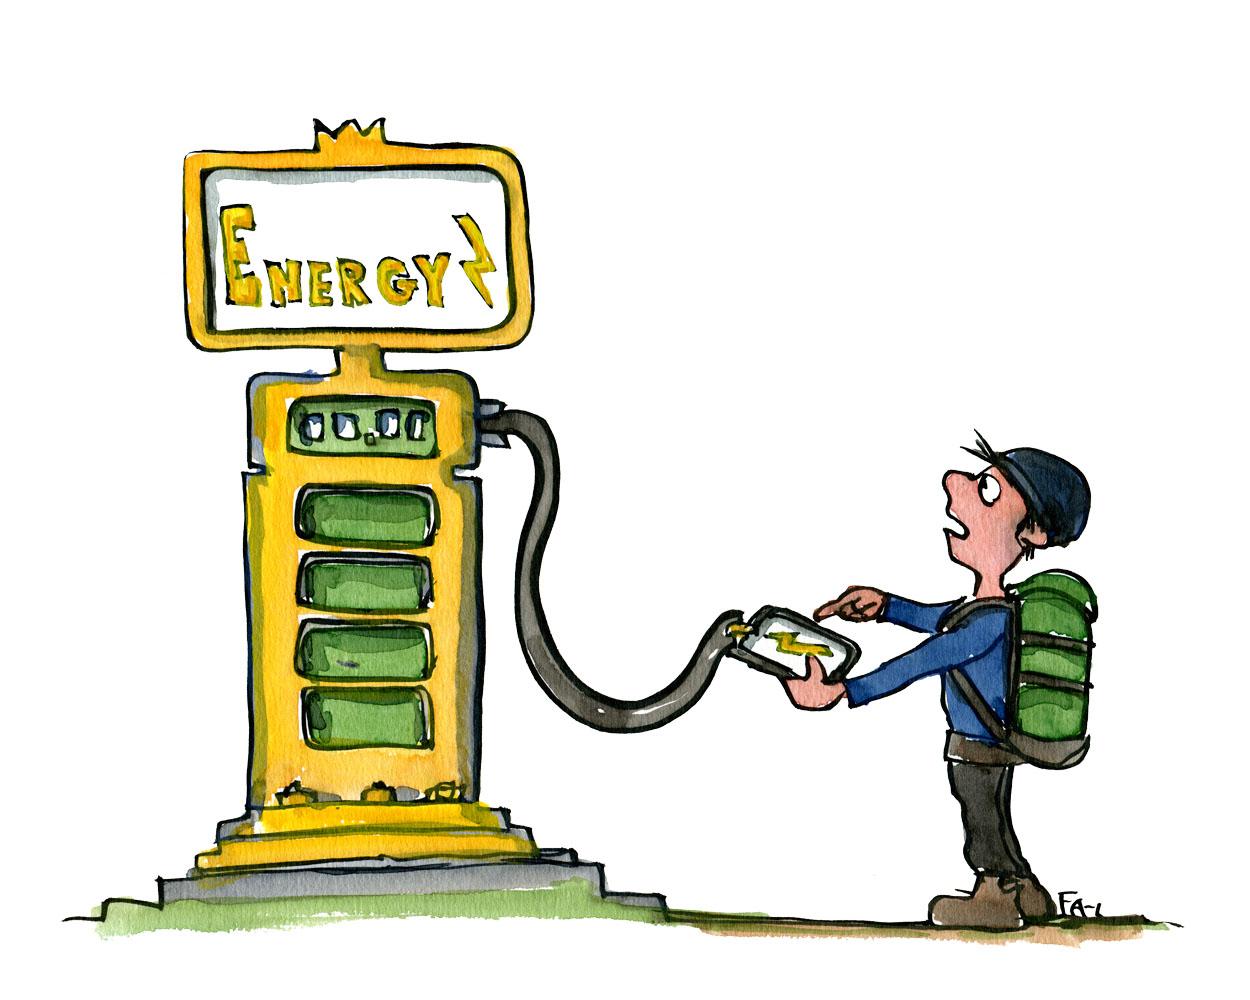 hiker recharging mobile phone on gas station like power station. illustration by Frits Ahlefeldt